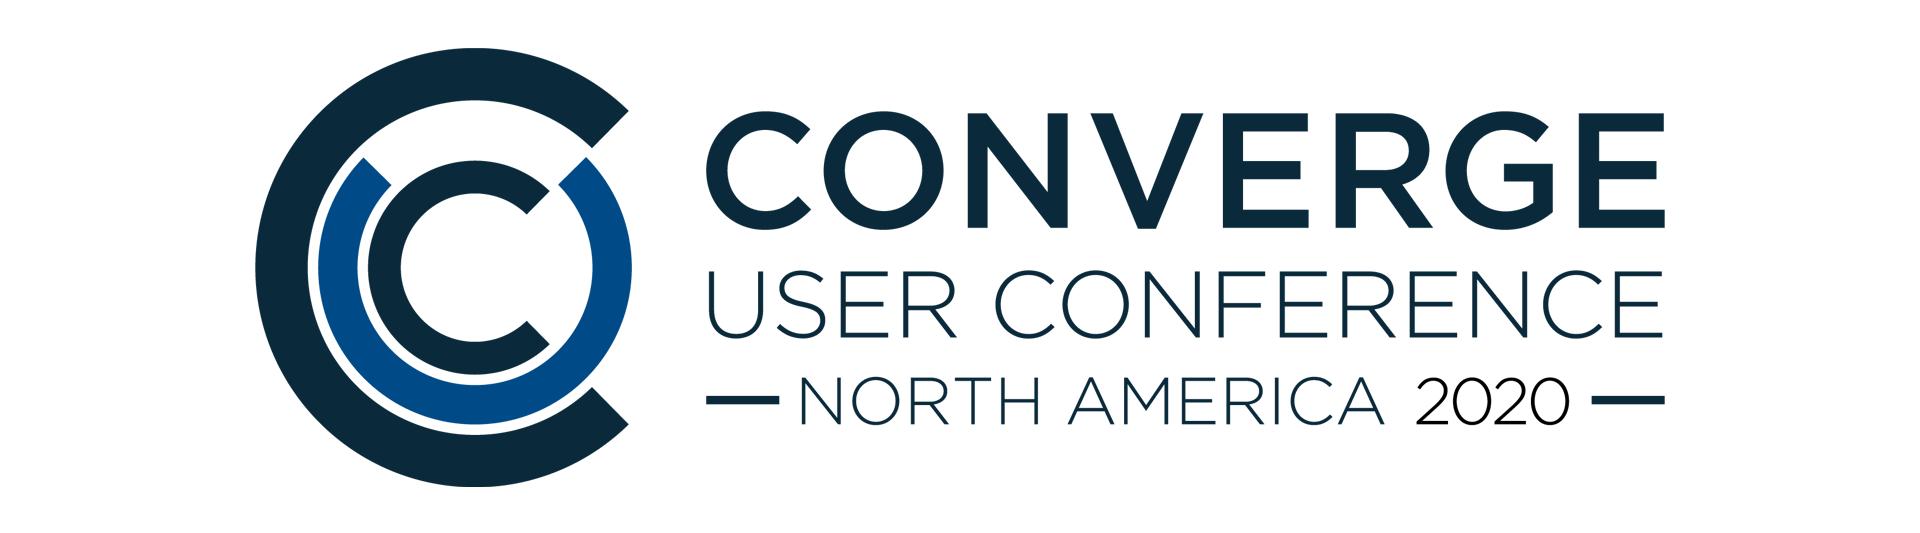 2020 CONVERGE User Conference-North America